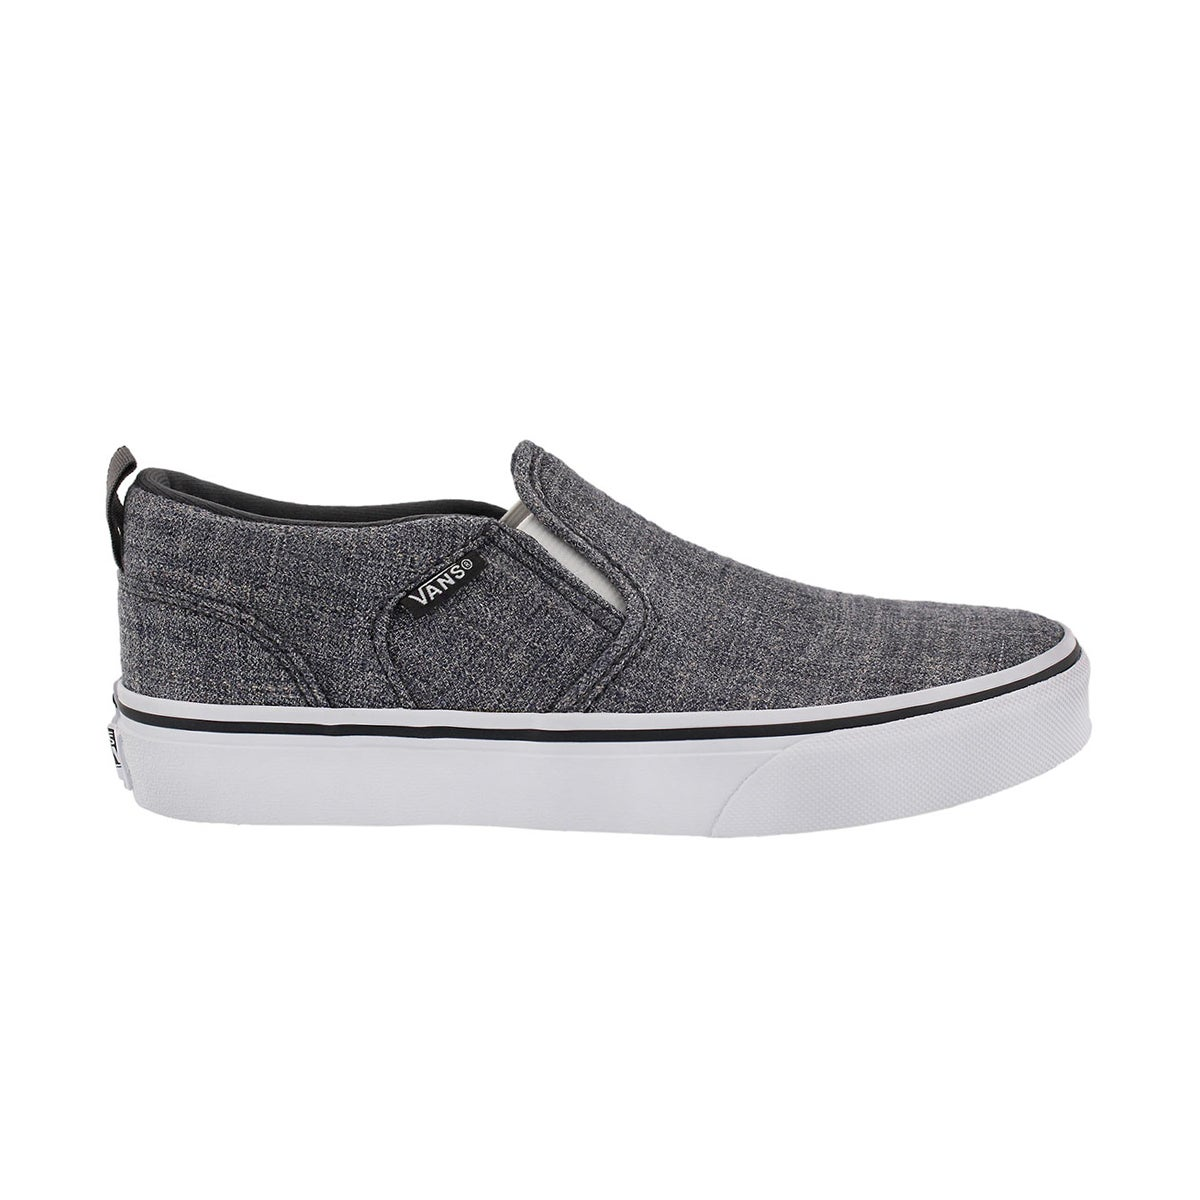 Bys Asher grey slipon sneaker